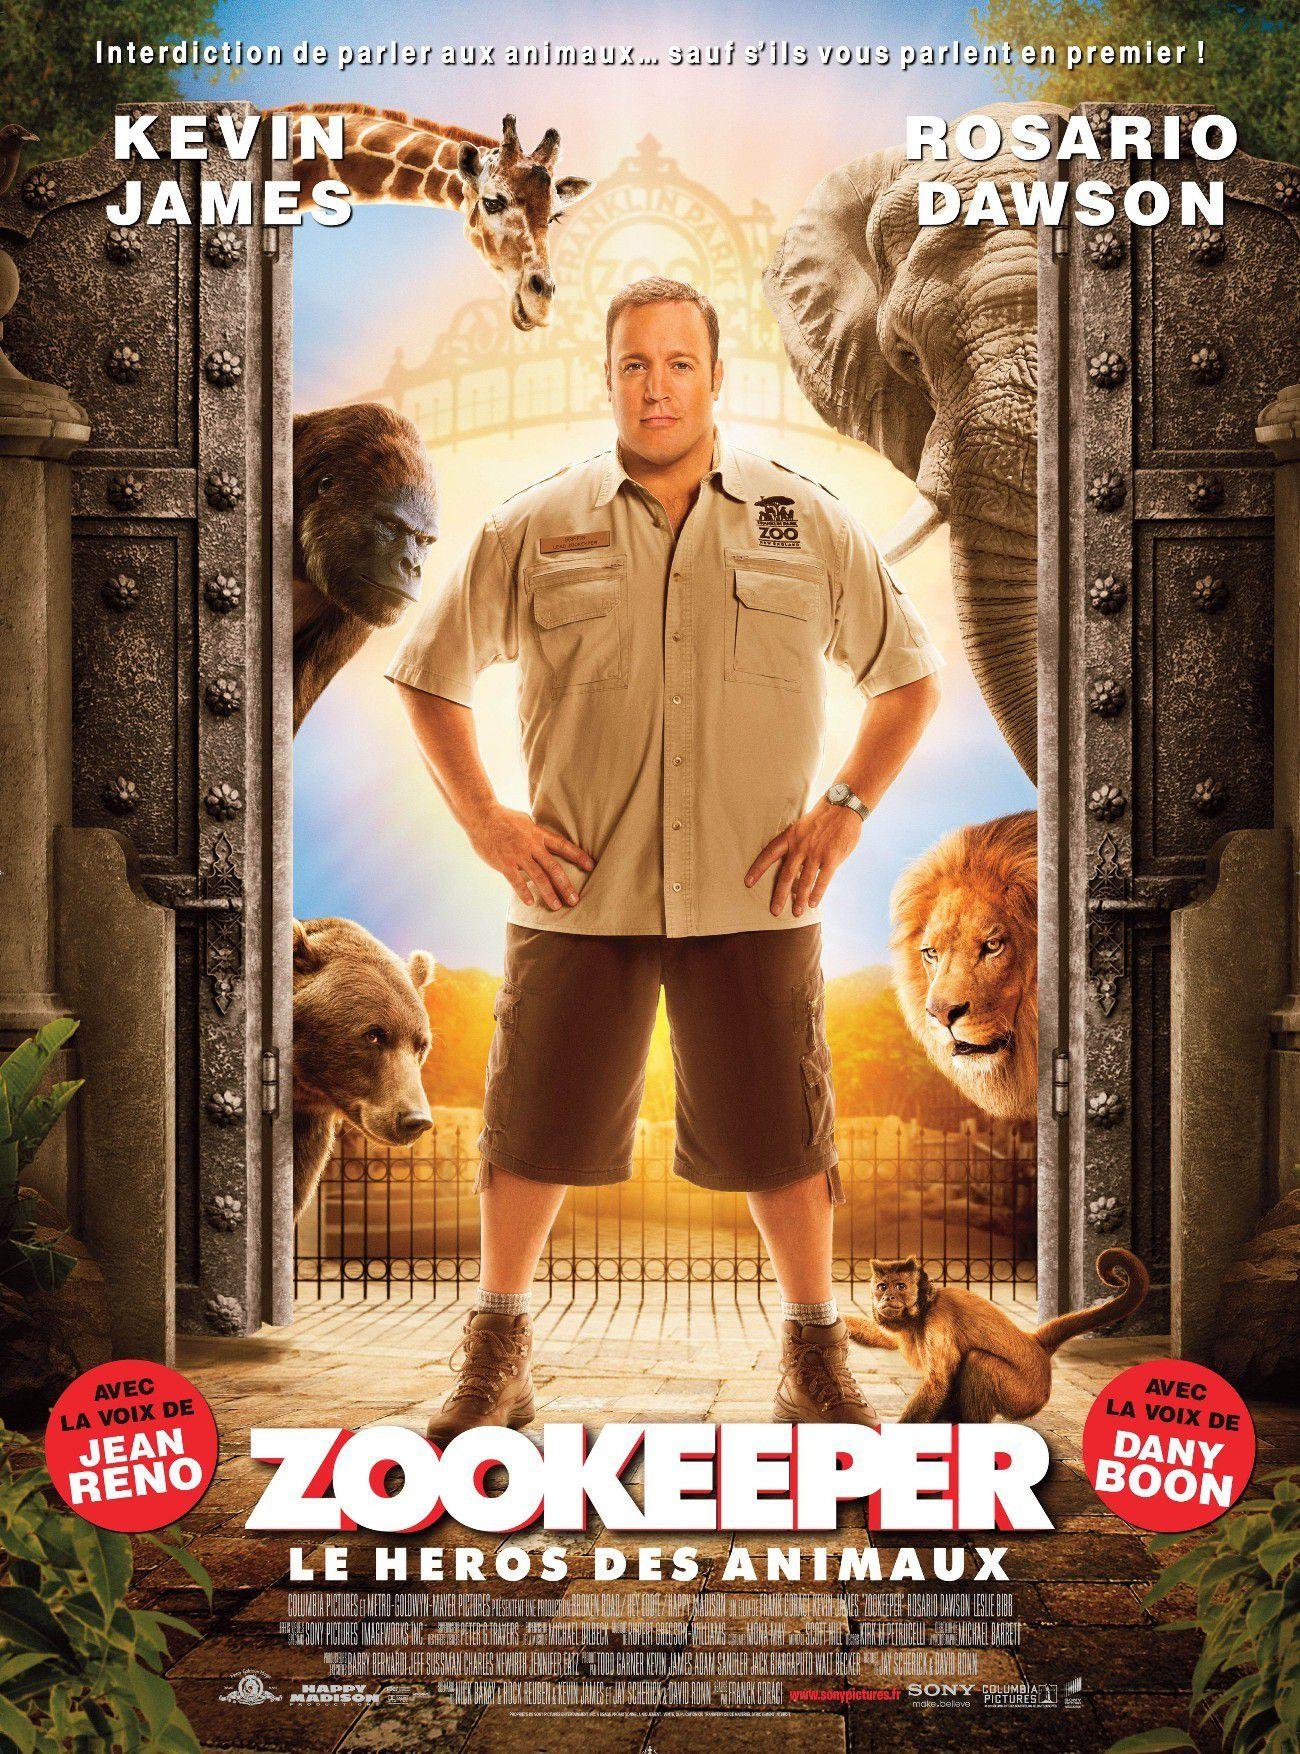 Zookeeper, le héros des animaux - Film (2011)